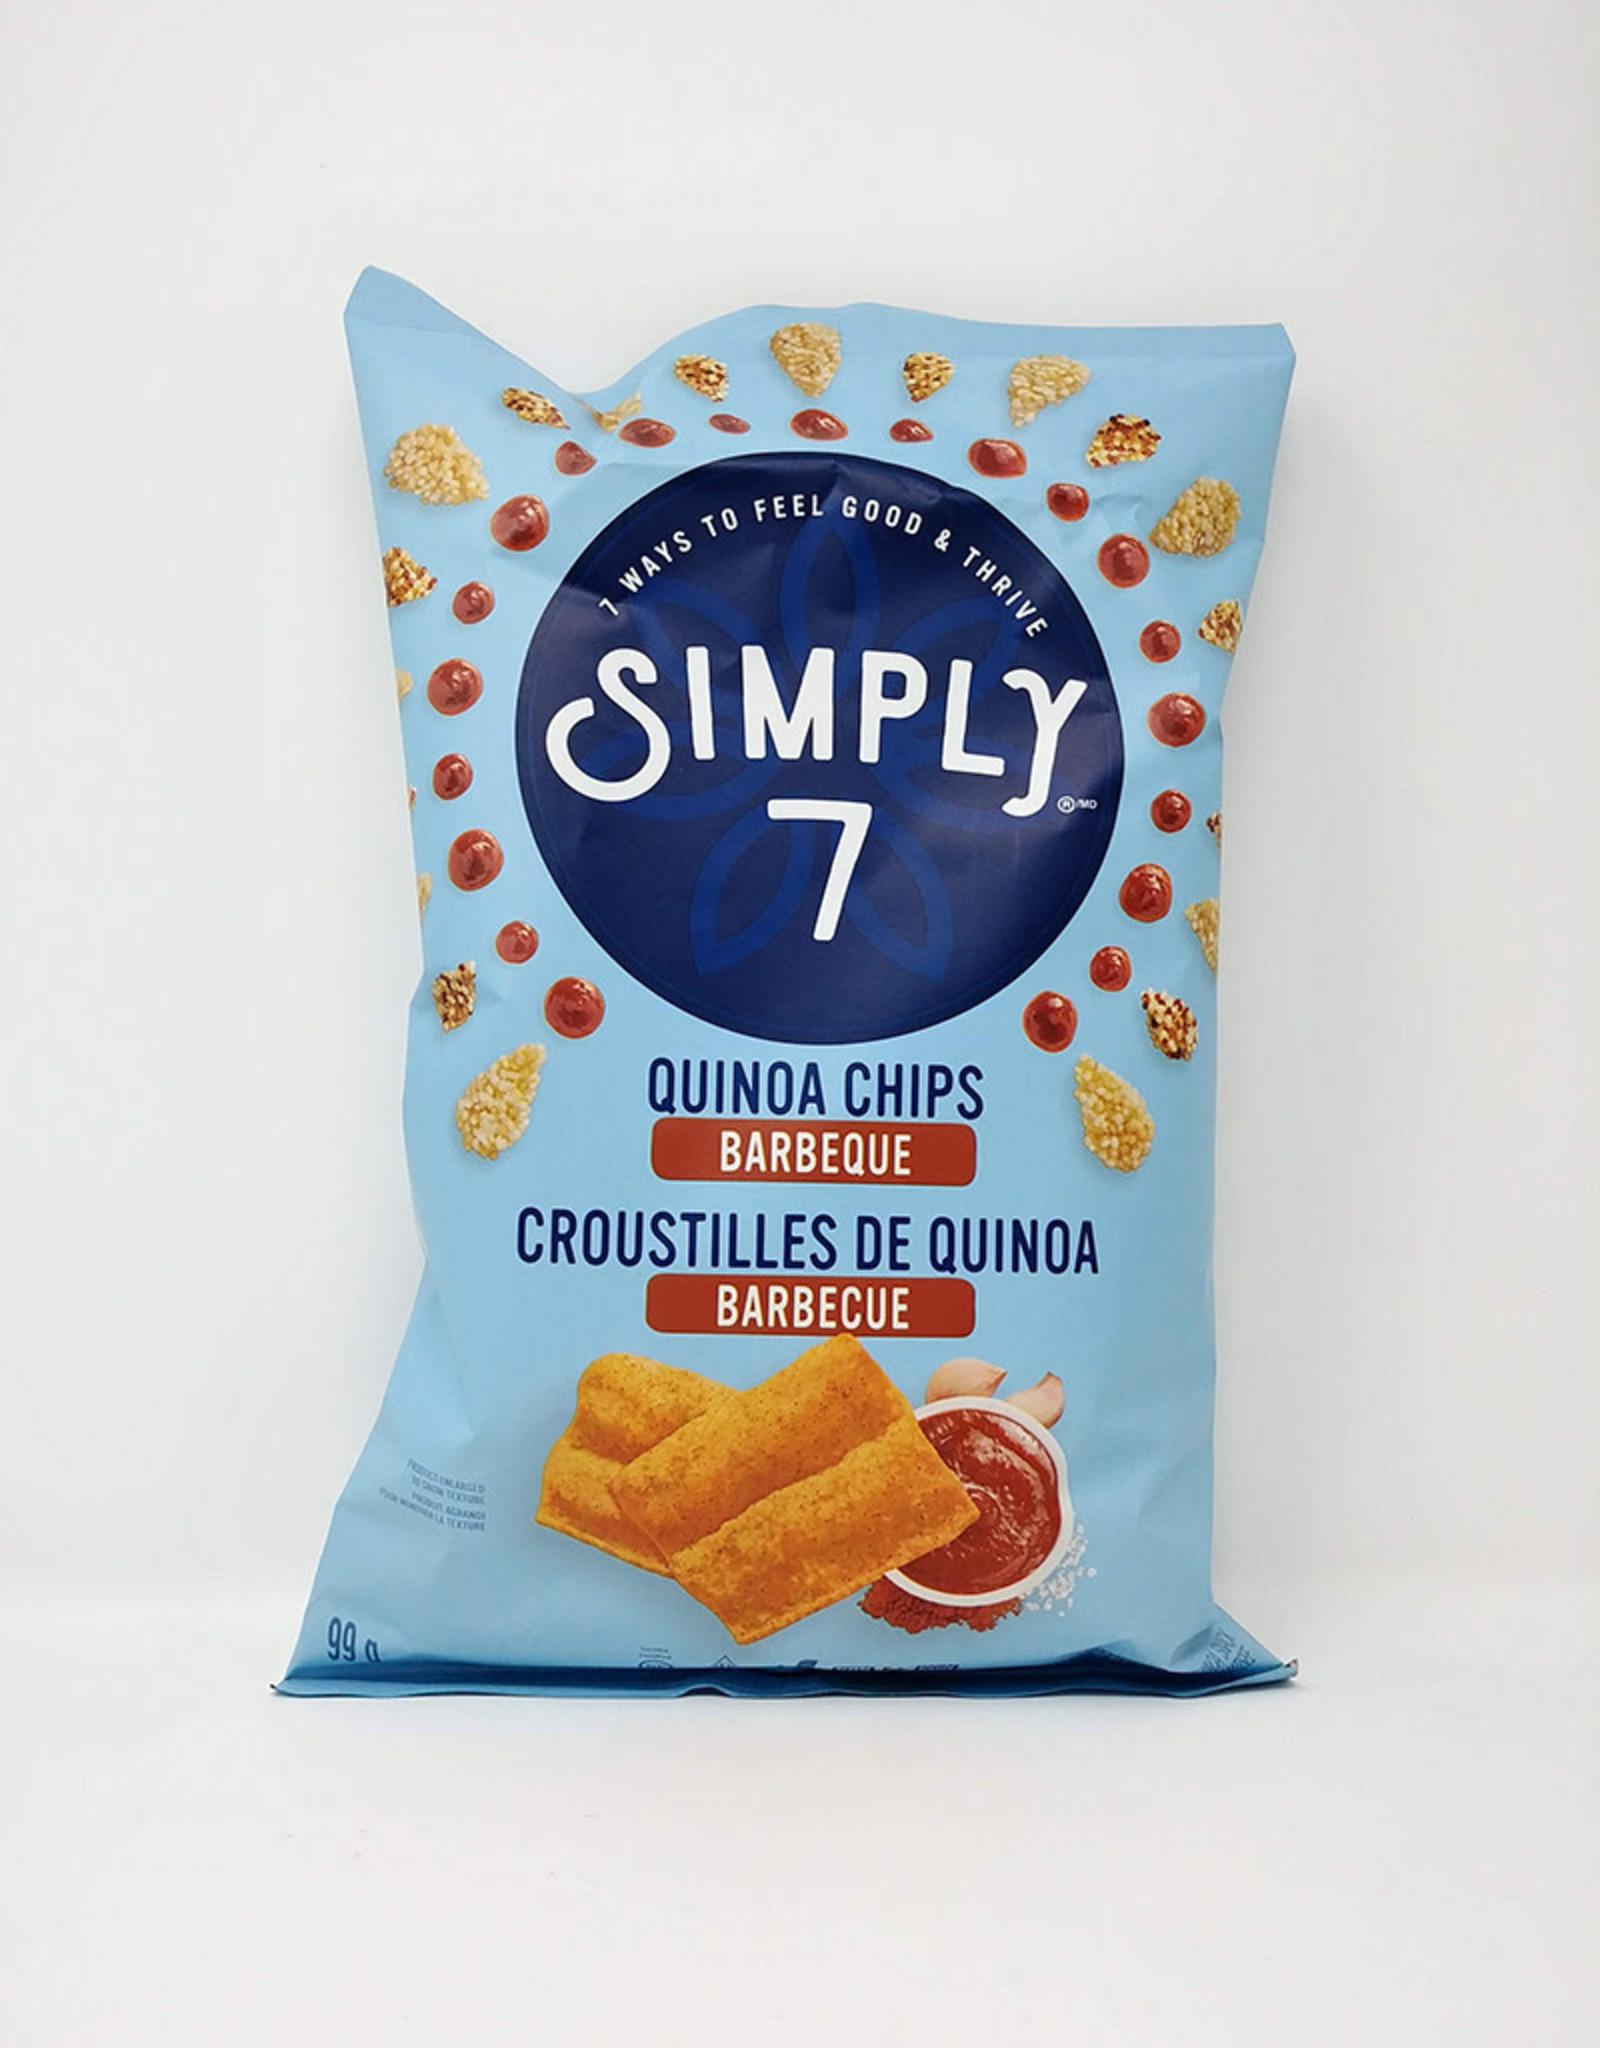 Simply 7 Simply 7 - Croustilles de Quinoa, BBQ (100g)